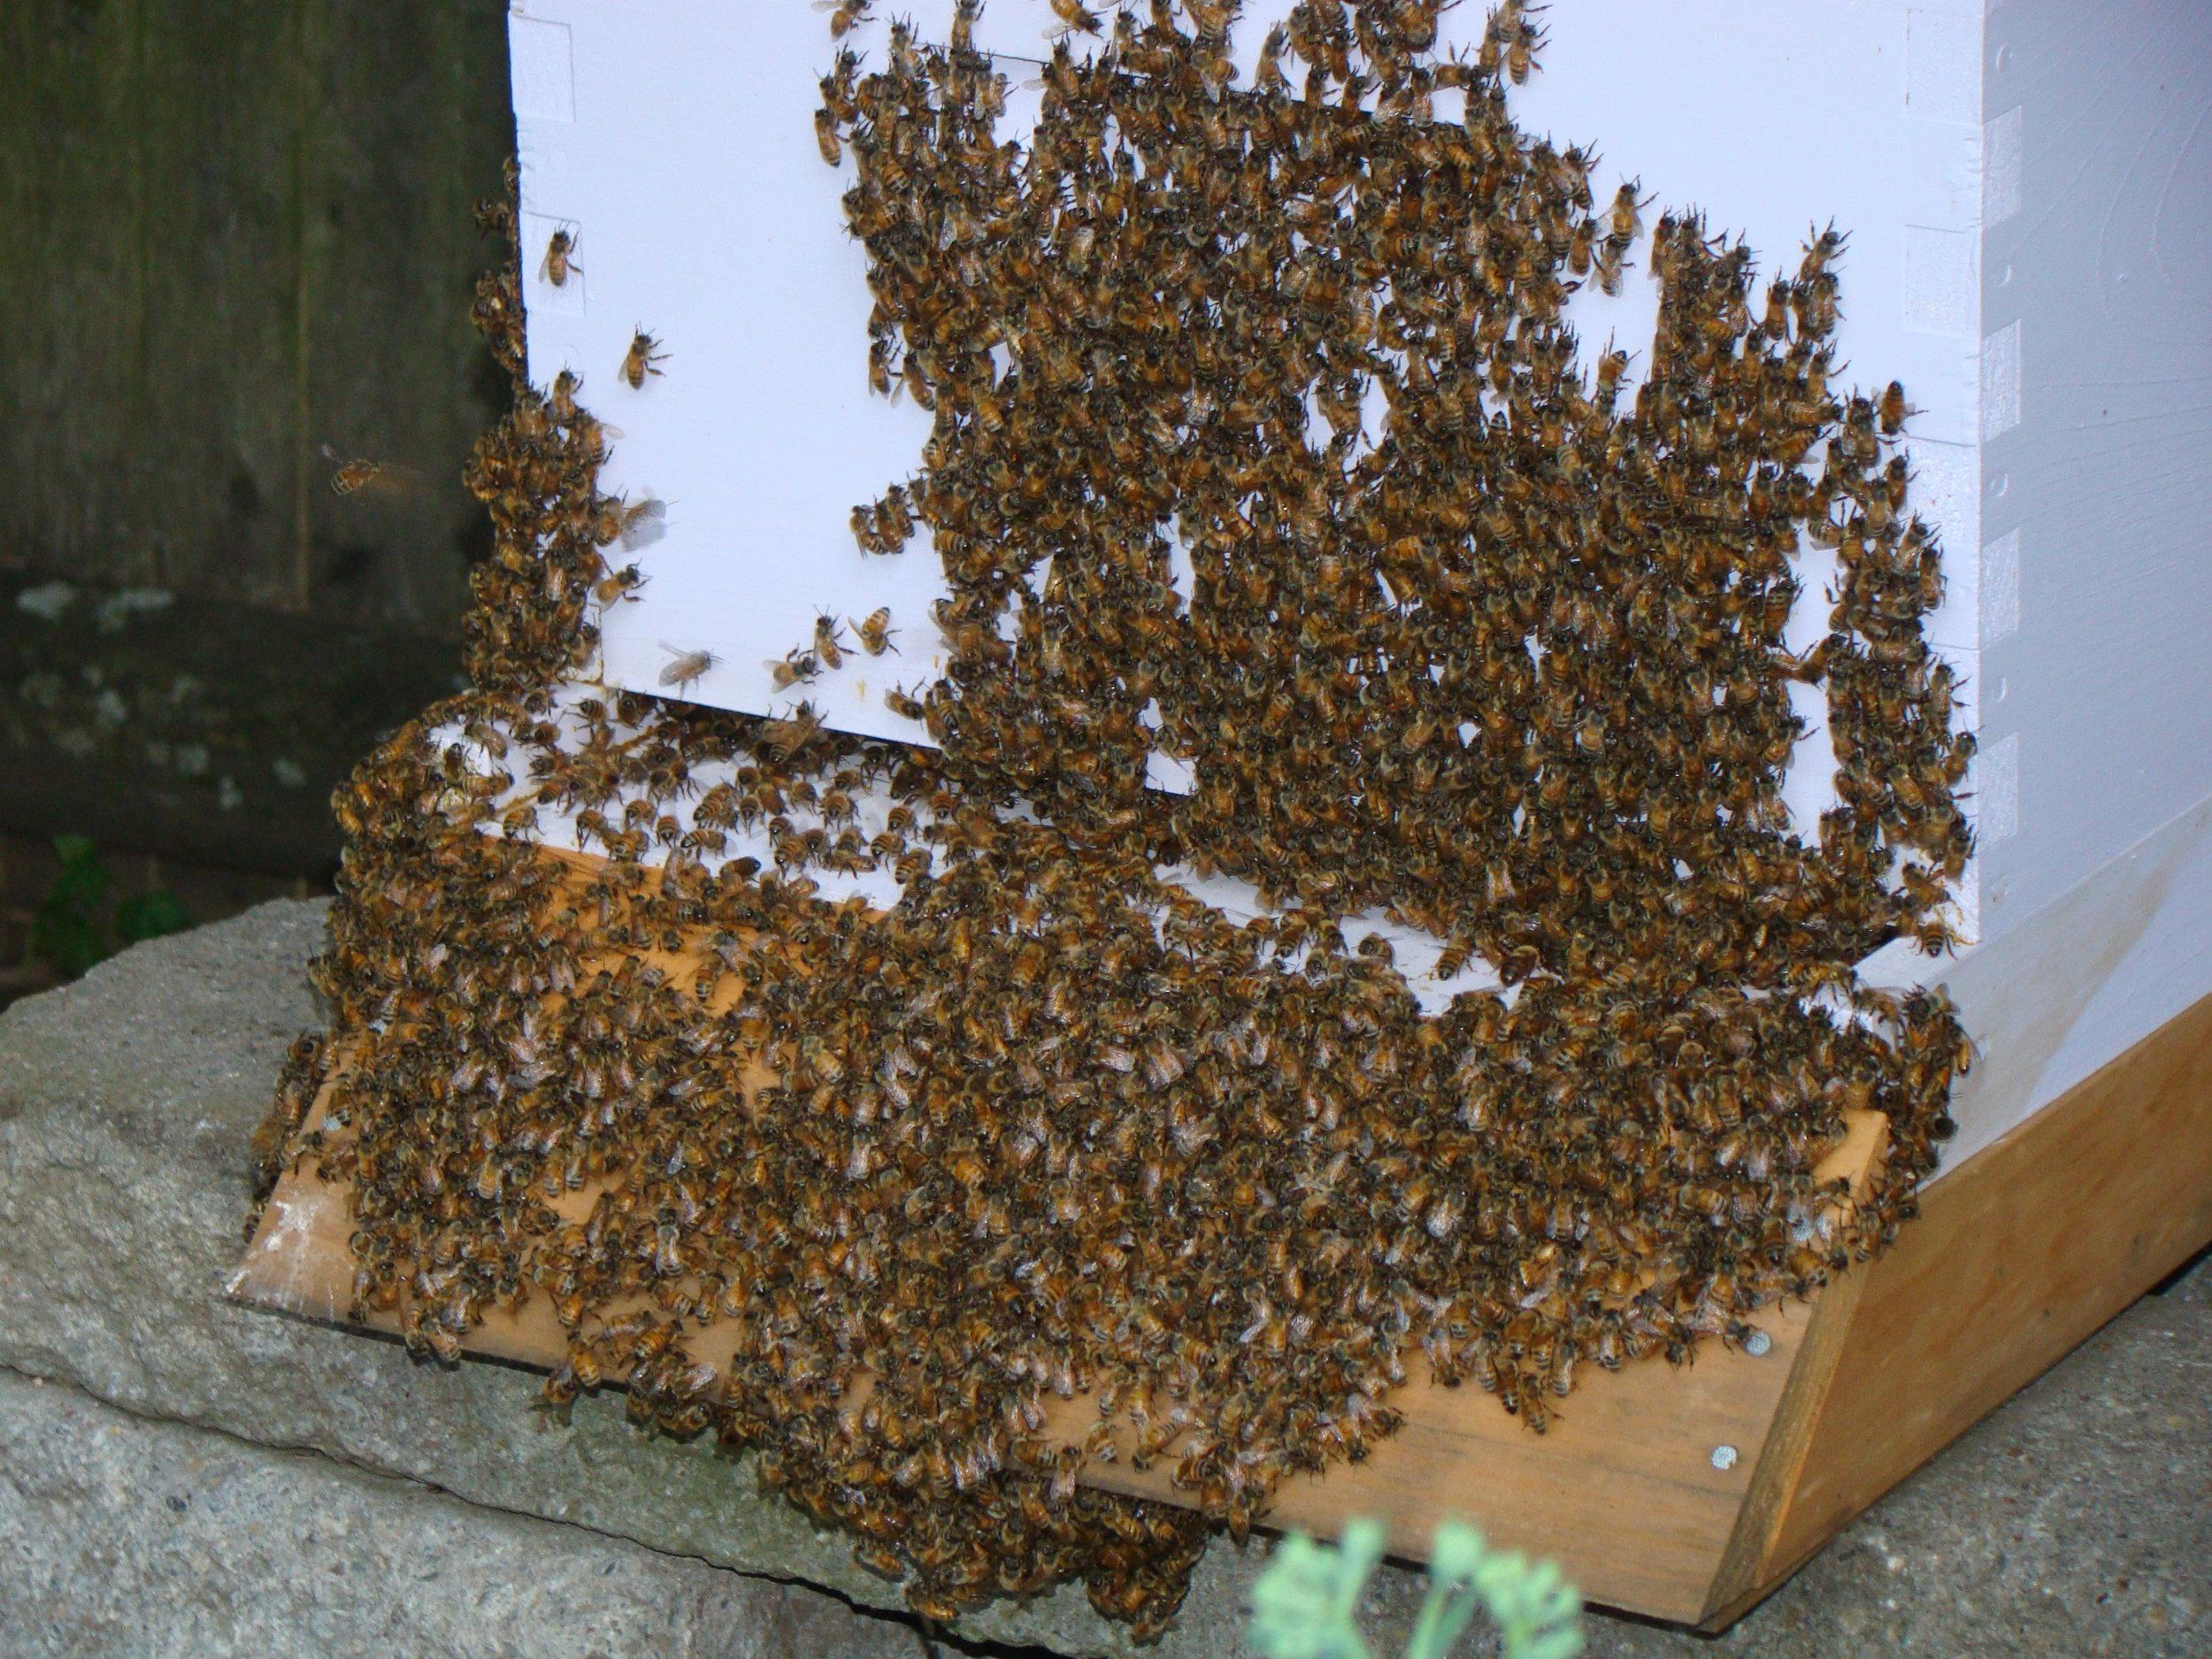 Bees bearding at the hive entrance